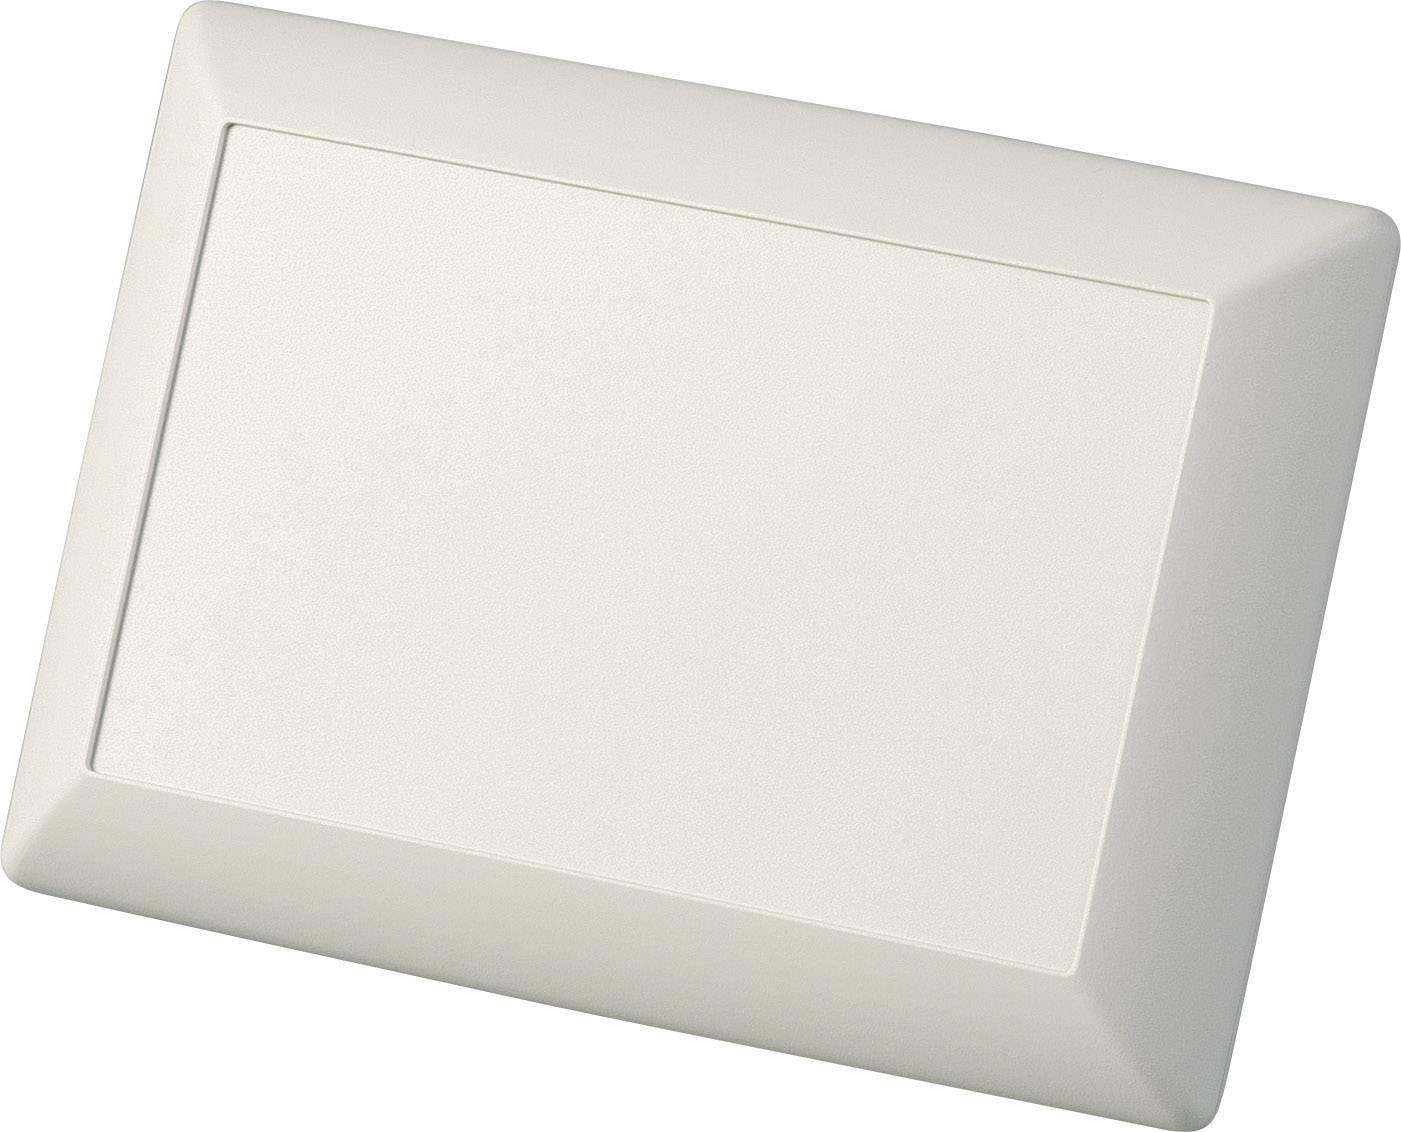 Pultové pouzdro ABS OKW D5017607, (d x š x v) 160 x 110 x 66 mm, šedá